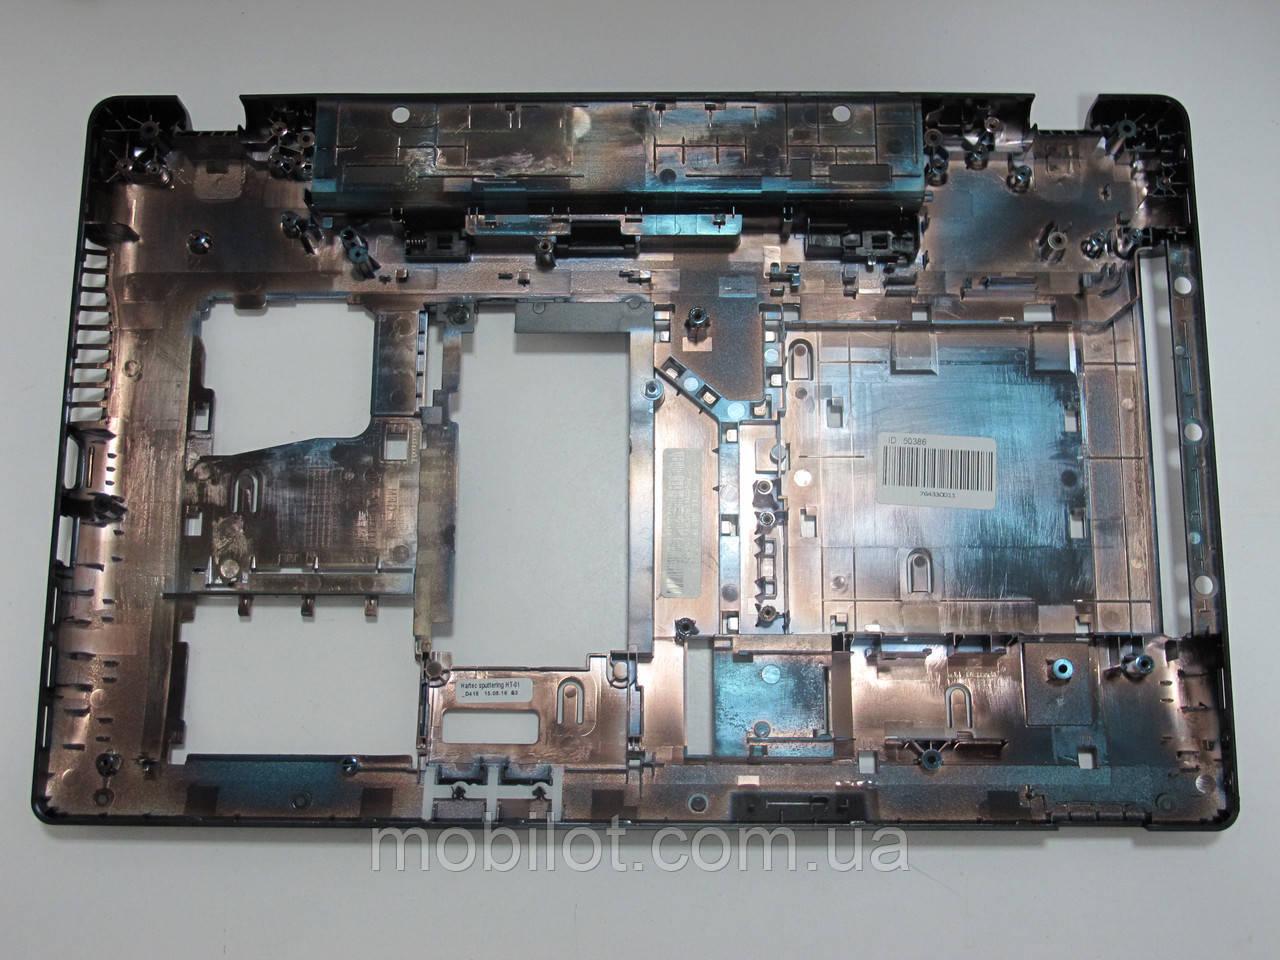 Часть корпуса (Поддон) Lenovo Z580 (NZ-6601)